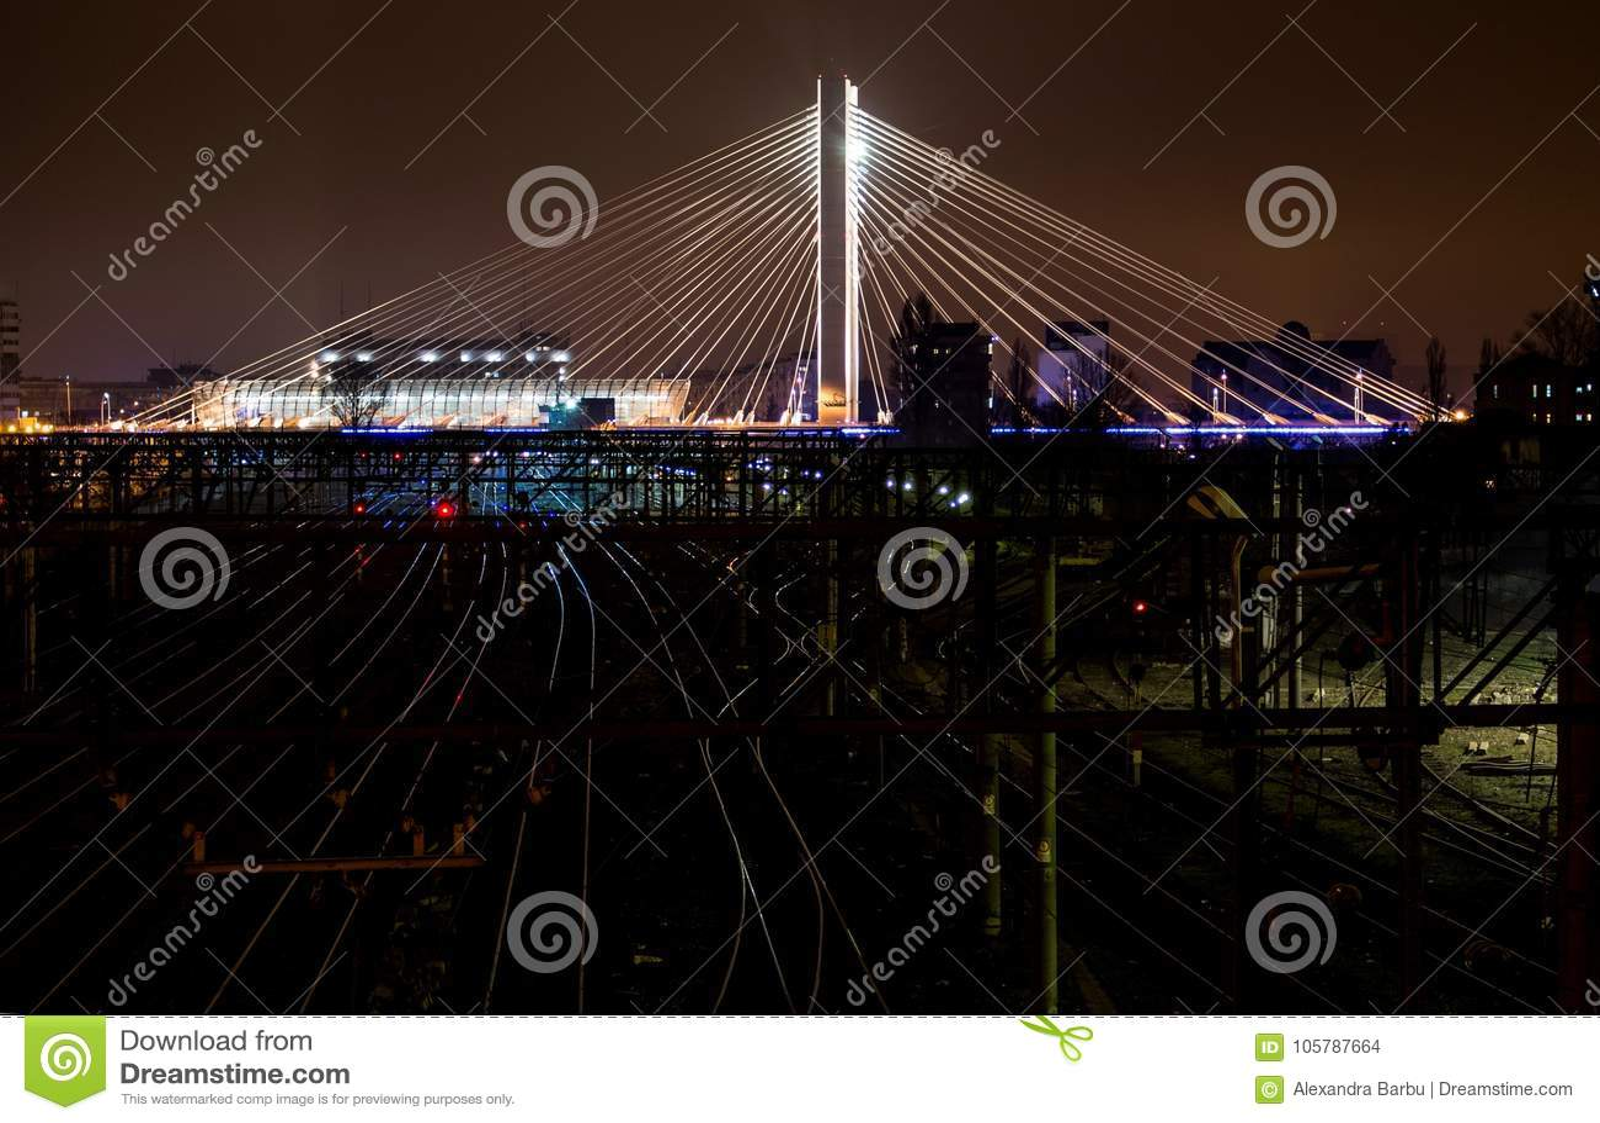 Download Illuminated Suspended Bridge Over Railway Urban Modern Landmark City Night Scene Stock Photo - Image of city, cable: 105787664